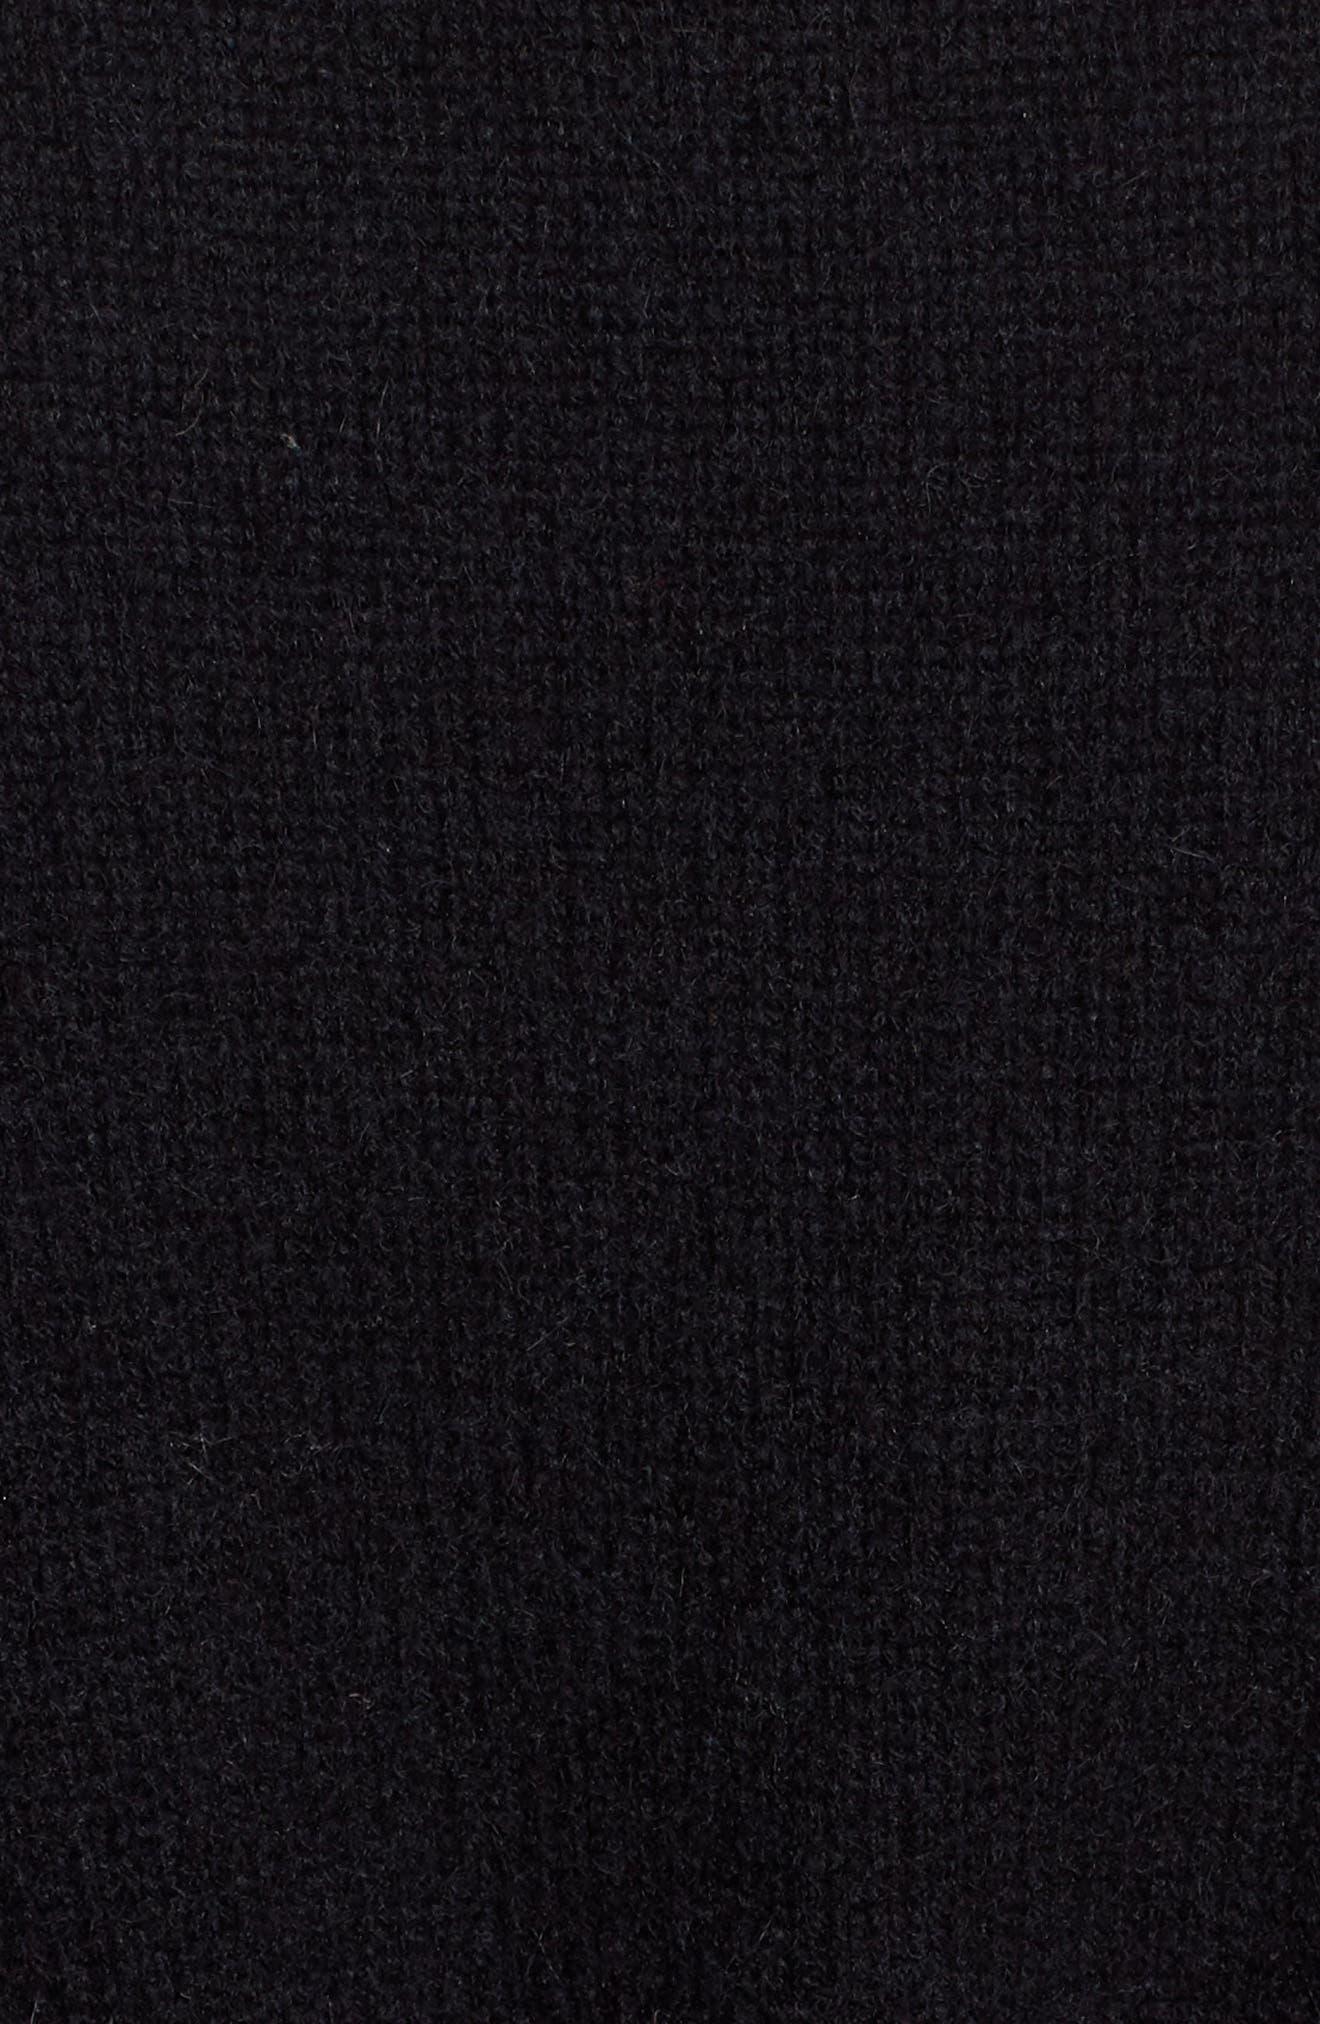 Belted Cashmere Kimono,                             Alternate thumbnail 5, color,                             001